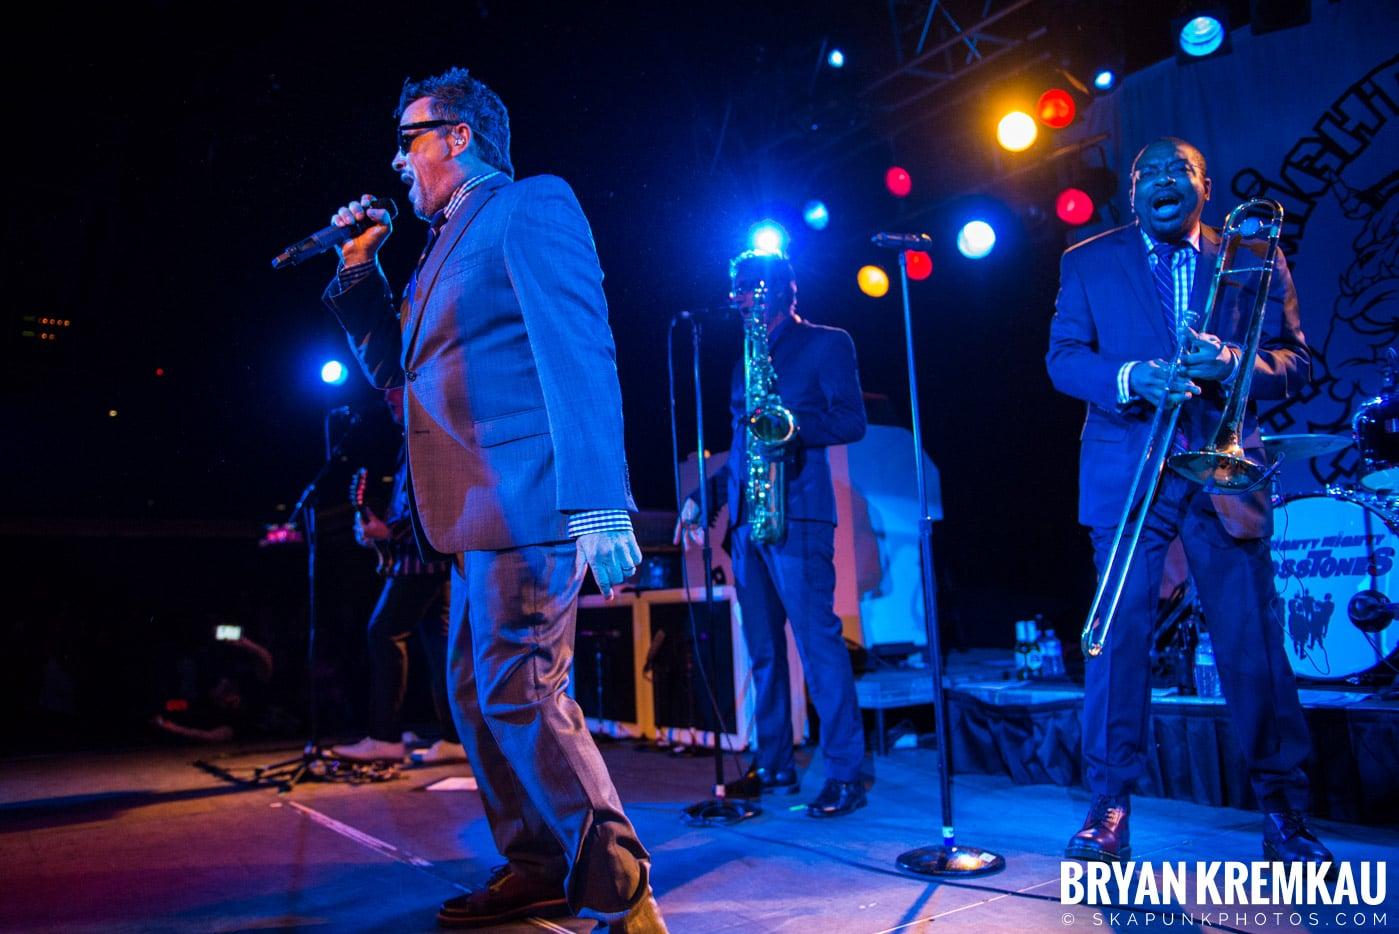 Mighty Mighty Bosstones @ Starland Ballroom, Sayreville, NJ - 7.29.17 (24)